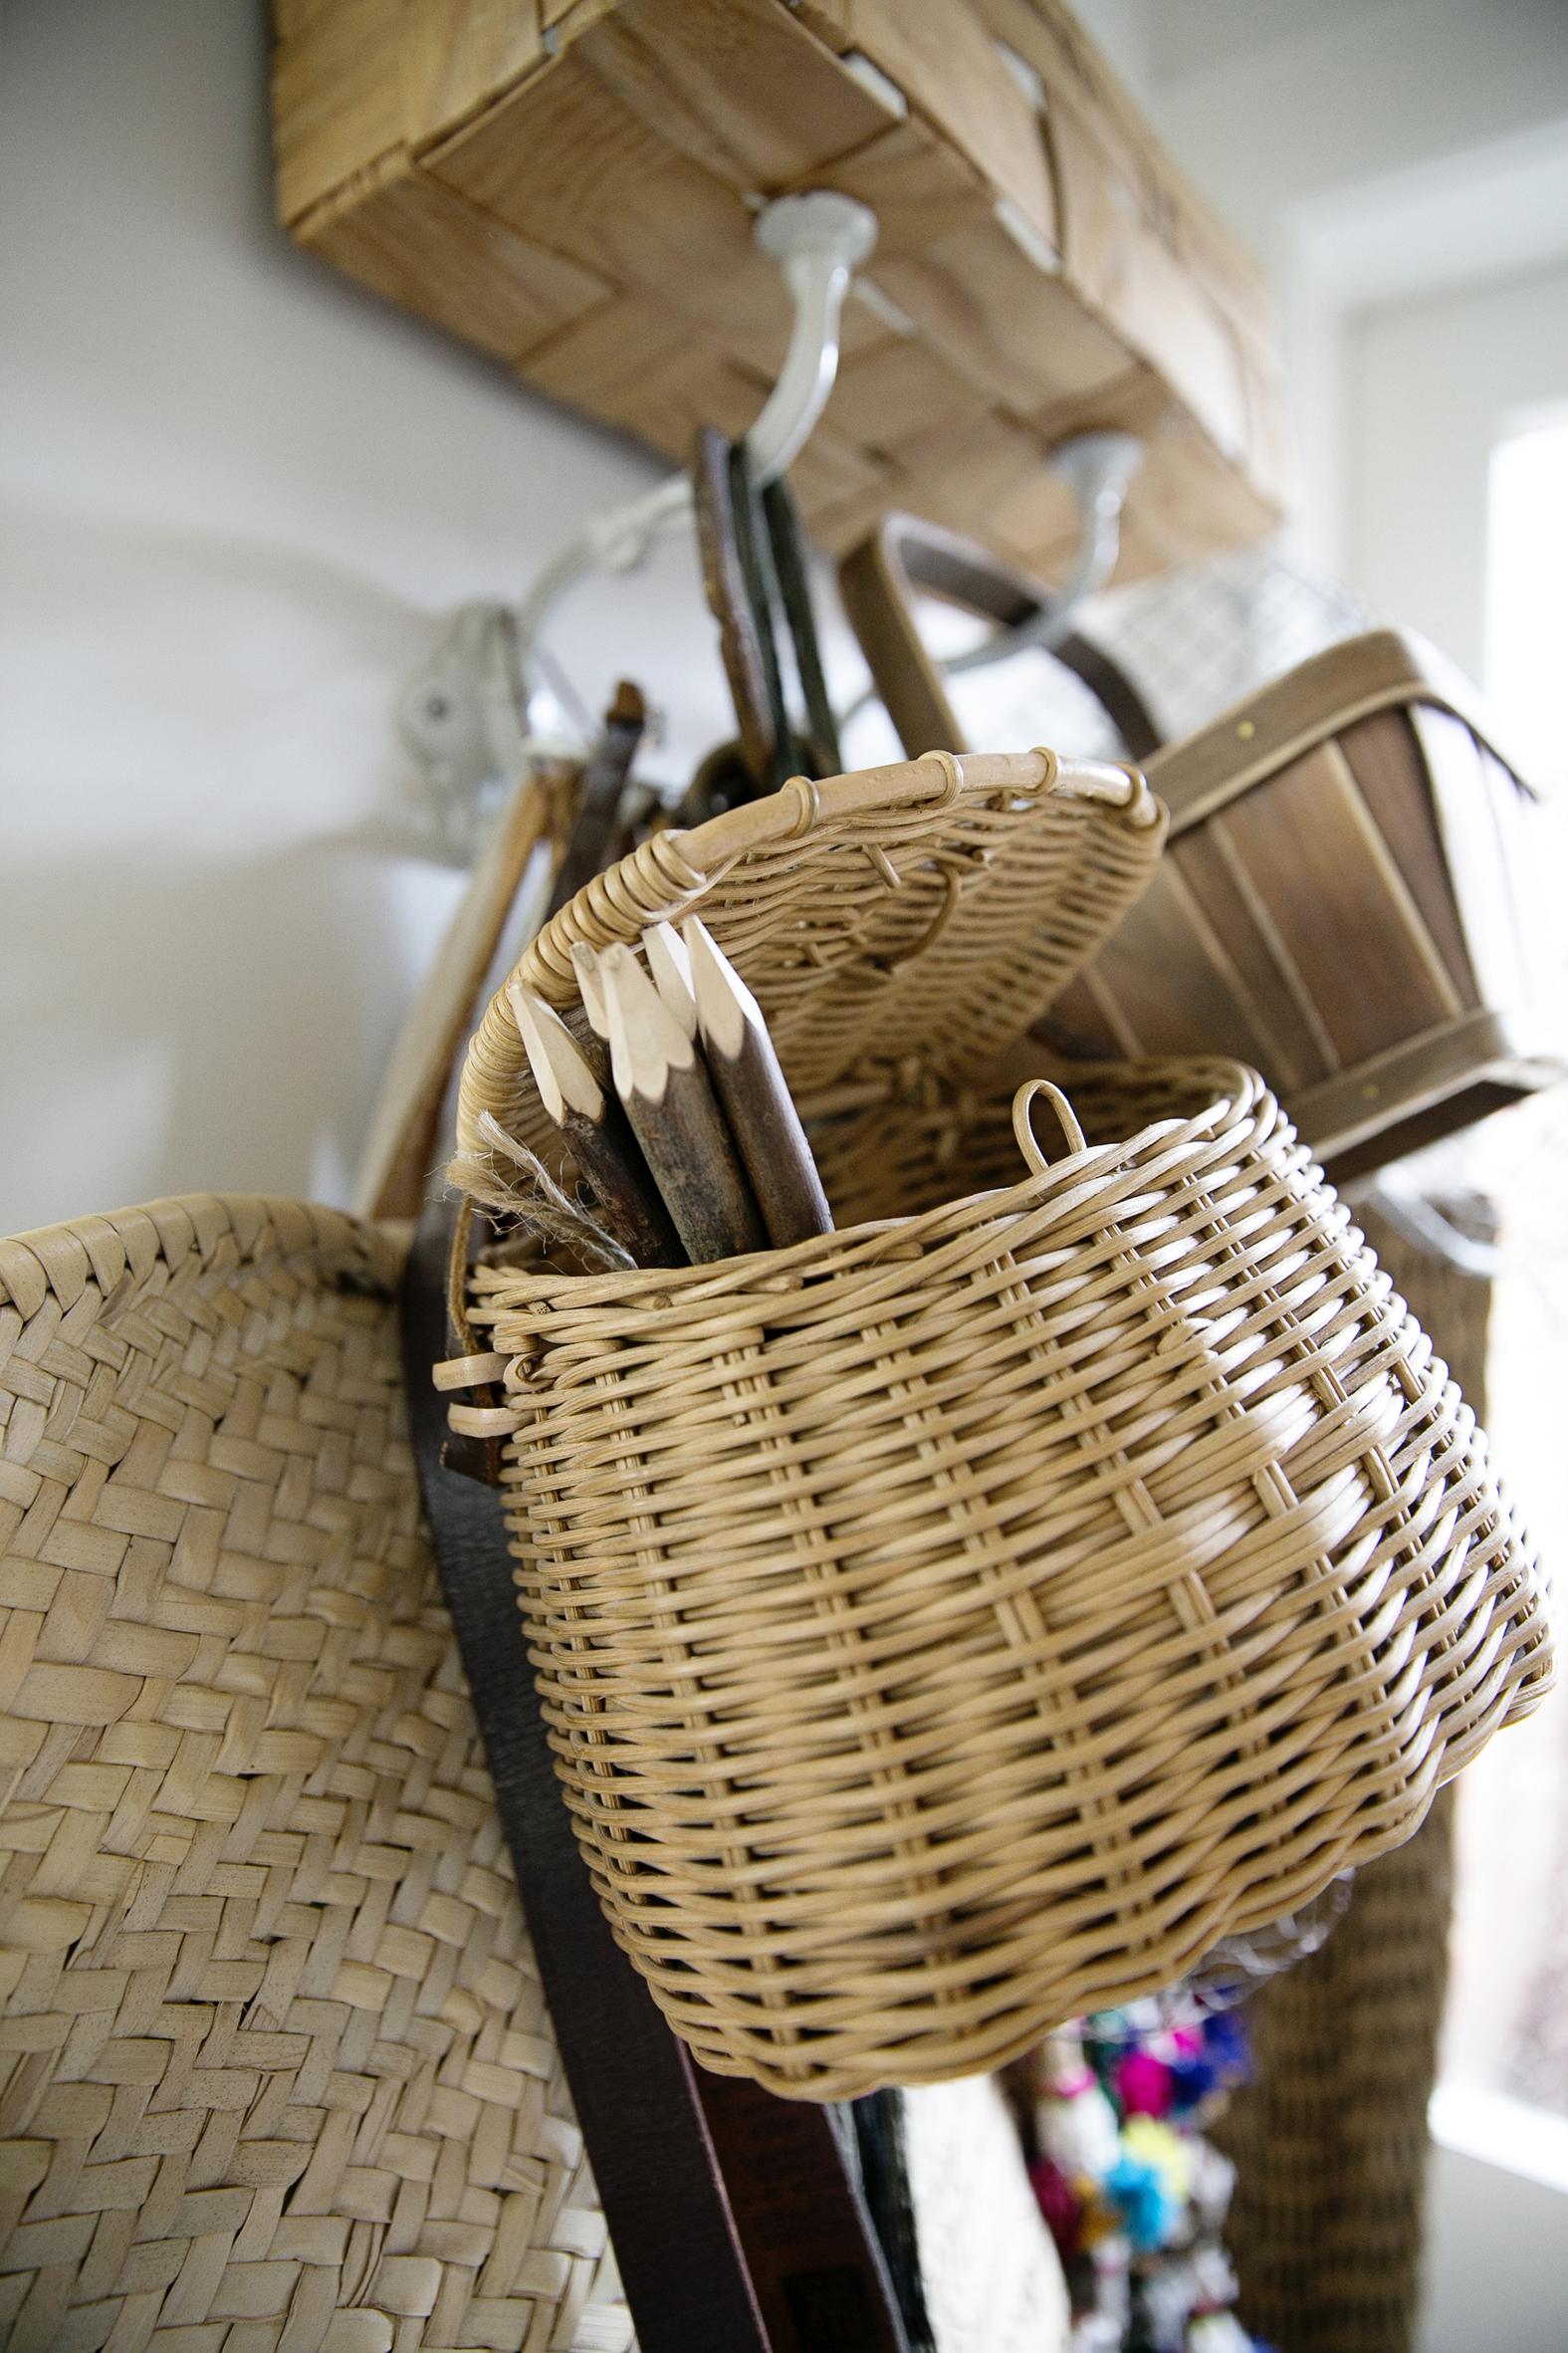 Baskets 037 copy.jpg